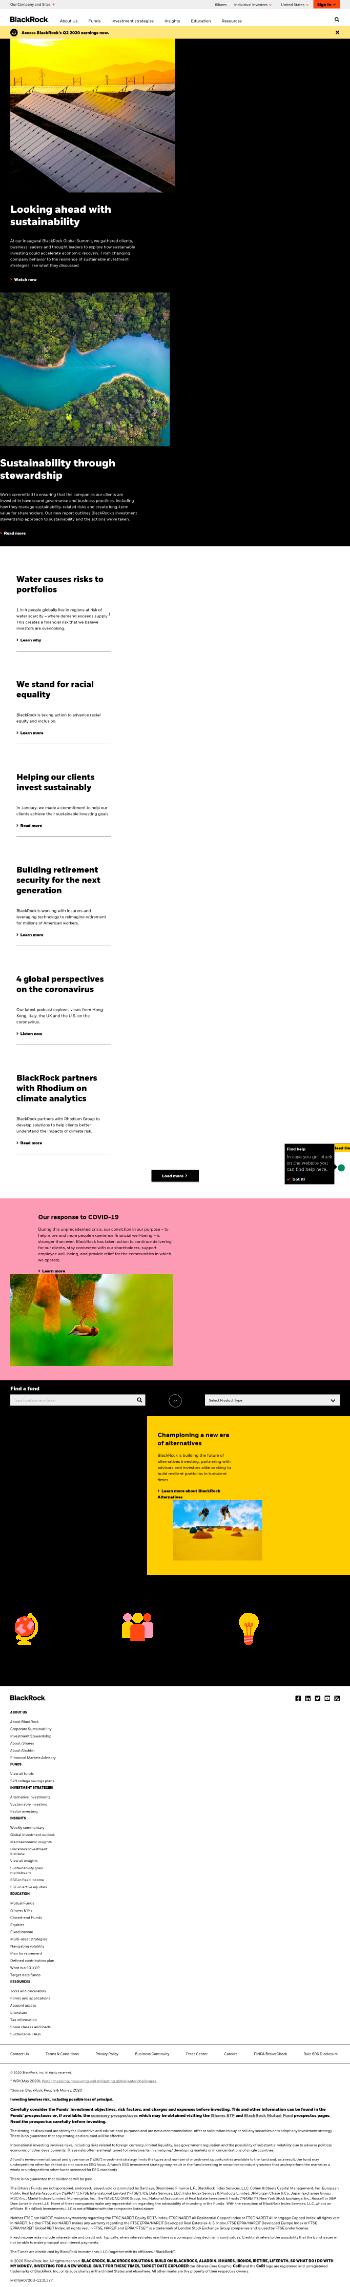 BlackRock MuniYield Fund, Inc. Website Screenshot